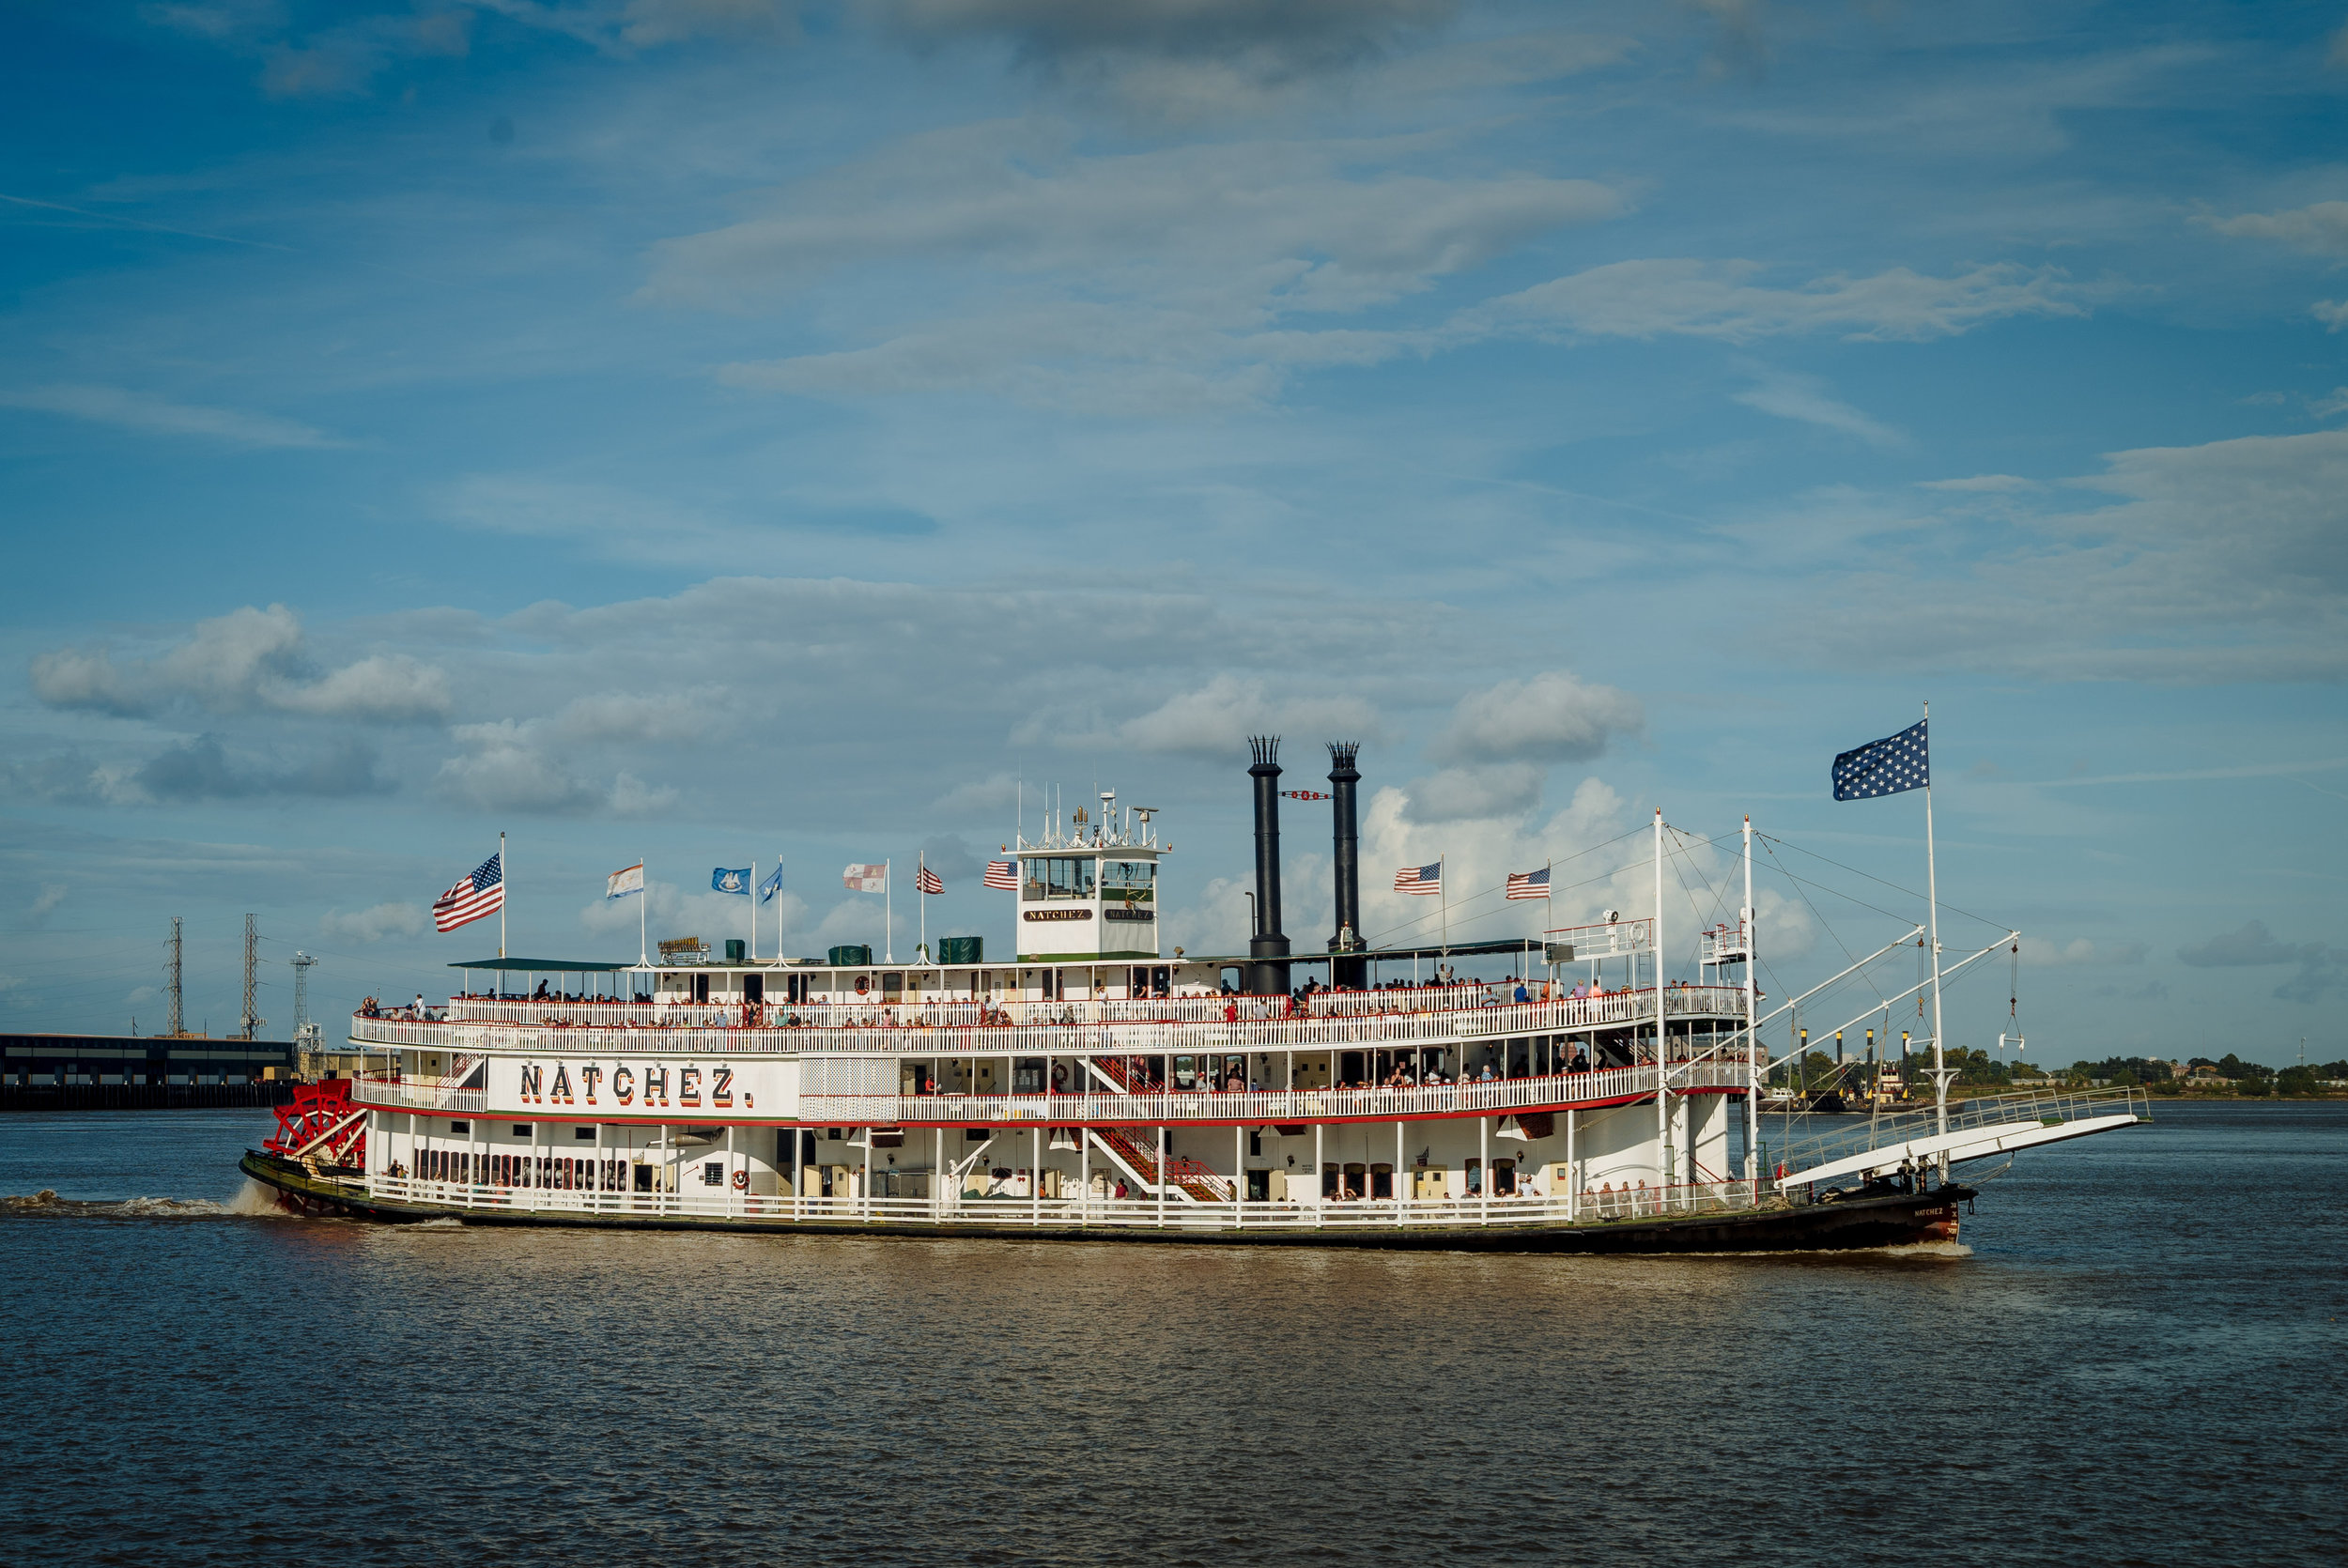 New Orleans_2016_Steamboat Natchez_00041.jpg